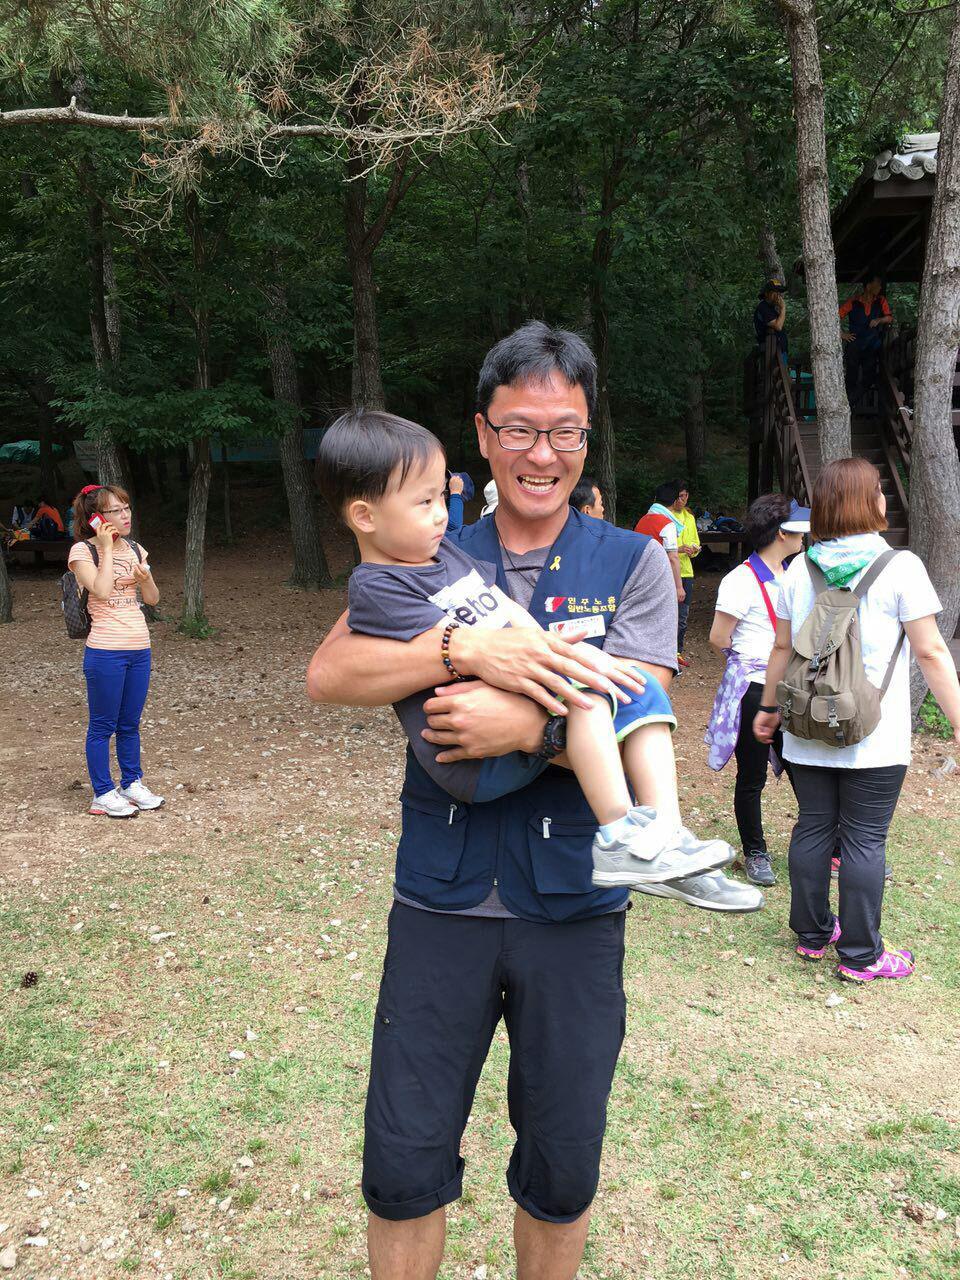 photo_2016-06-15_10-57-35.jpg